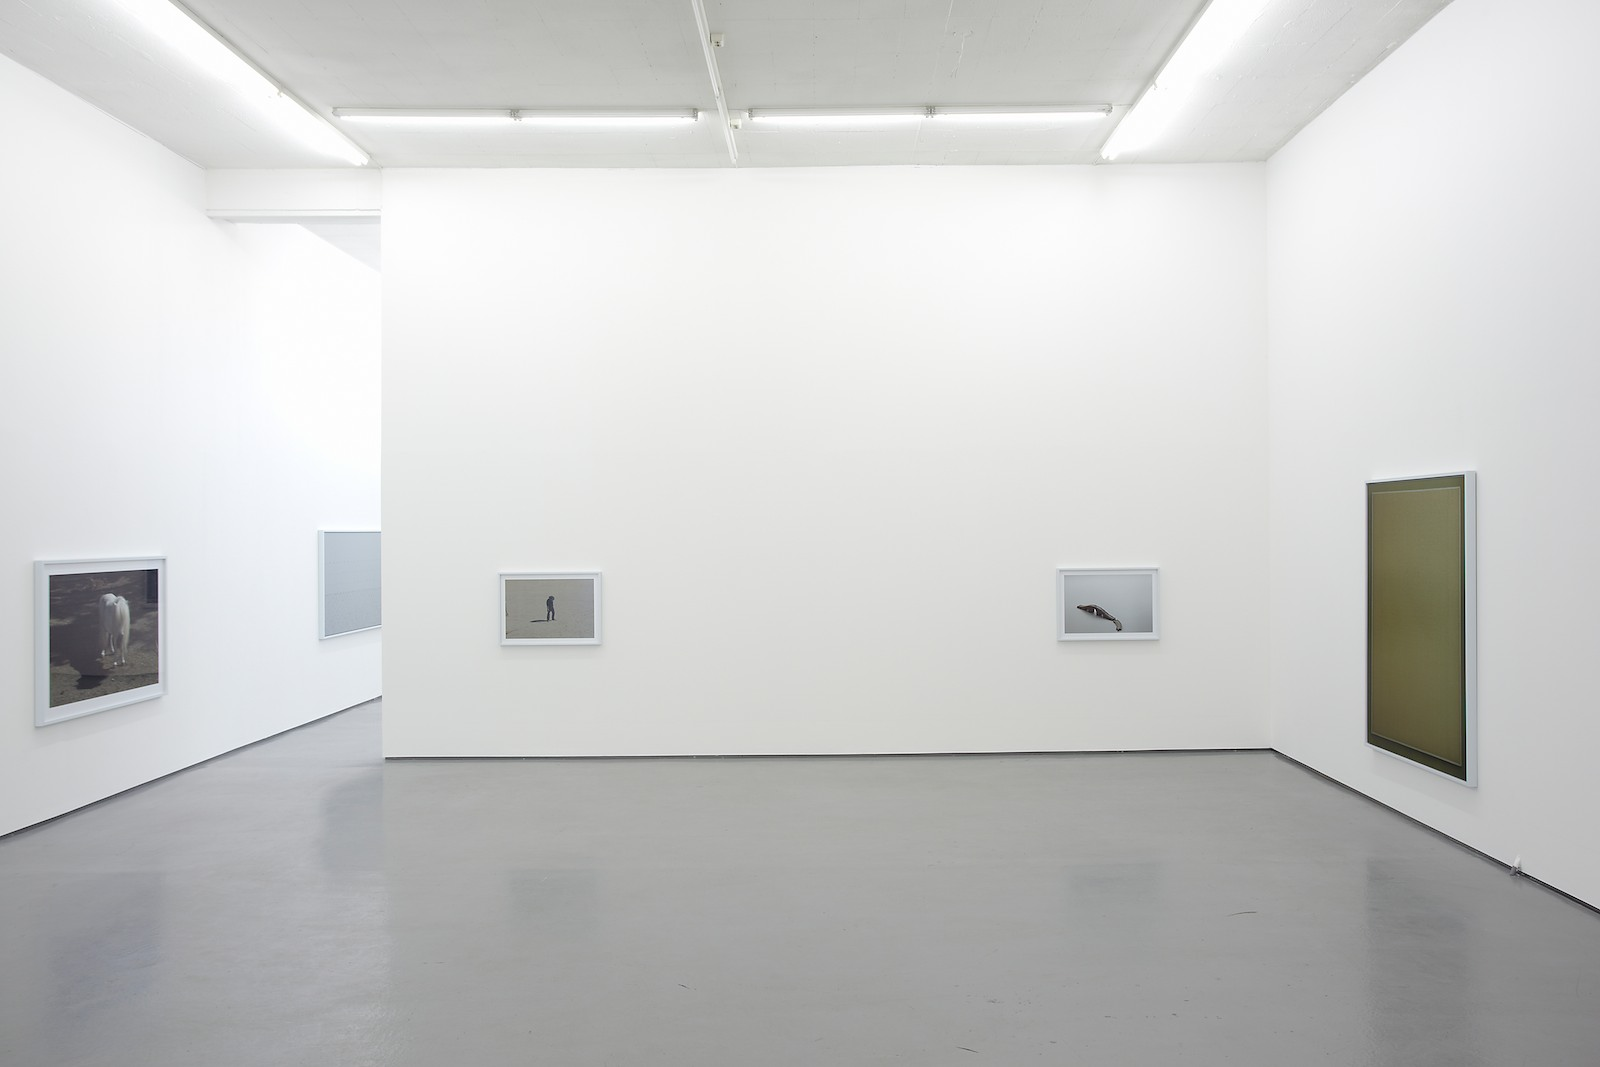 Installation view Morten Andenæs, Observance, Galleri Riis, Oslo, 2011